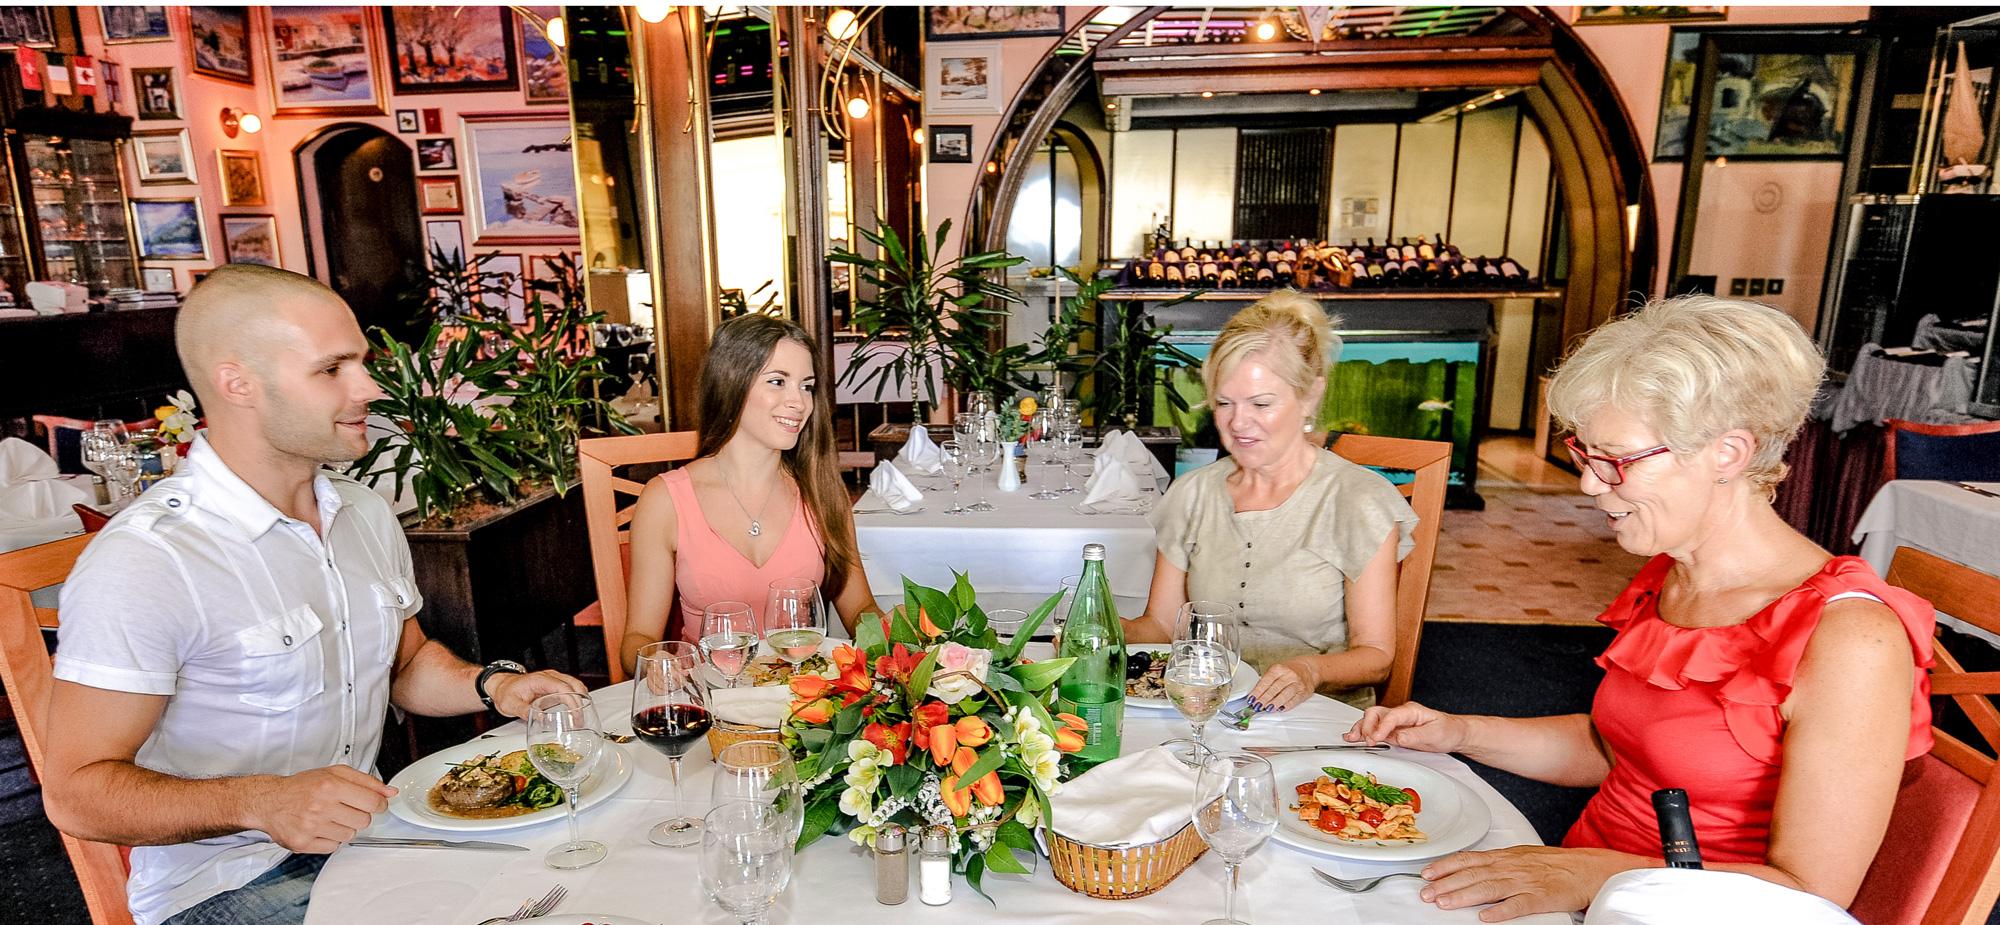 restoran-evergreen-2-1